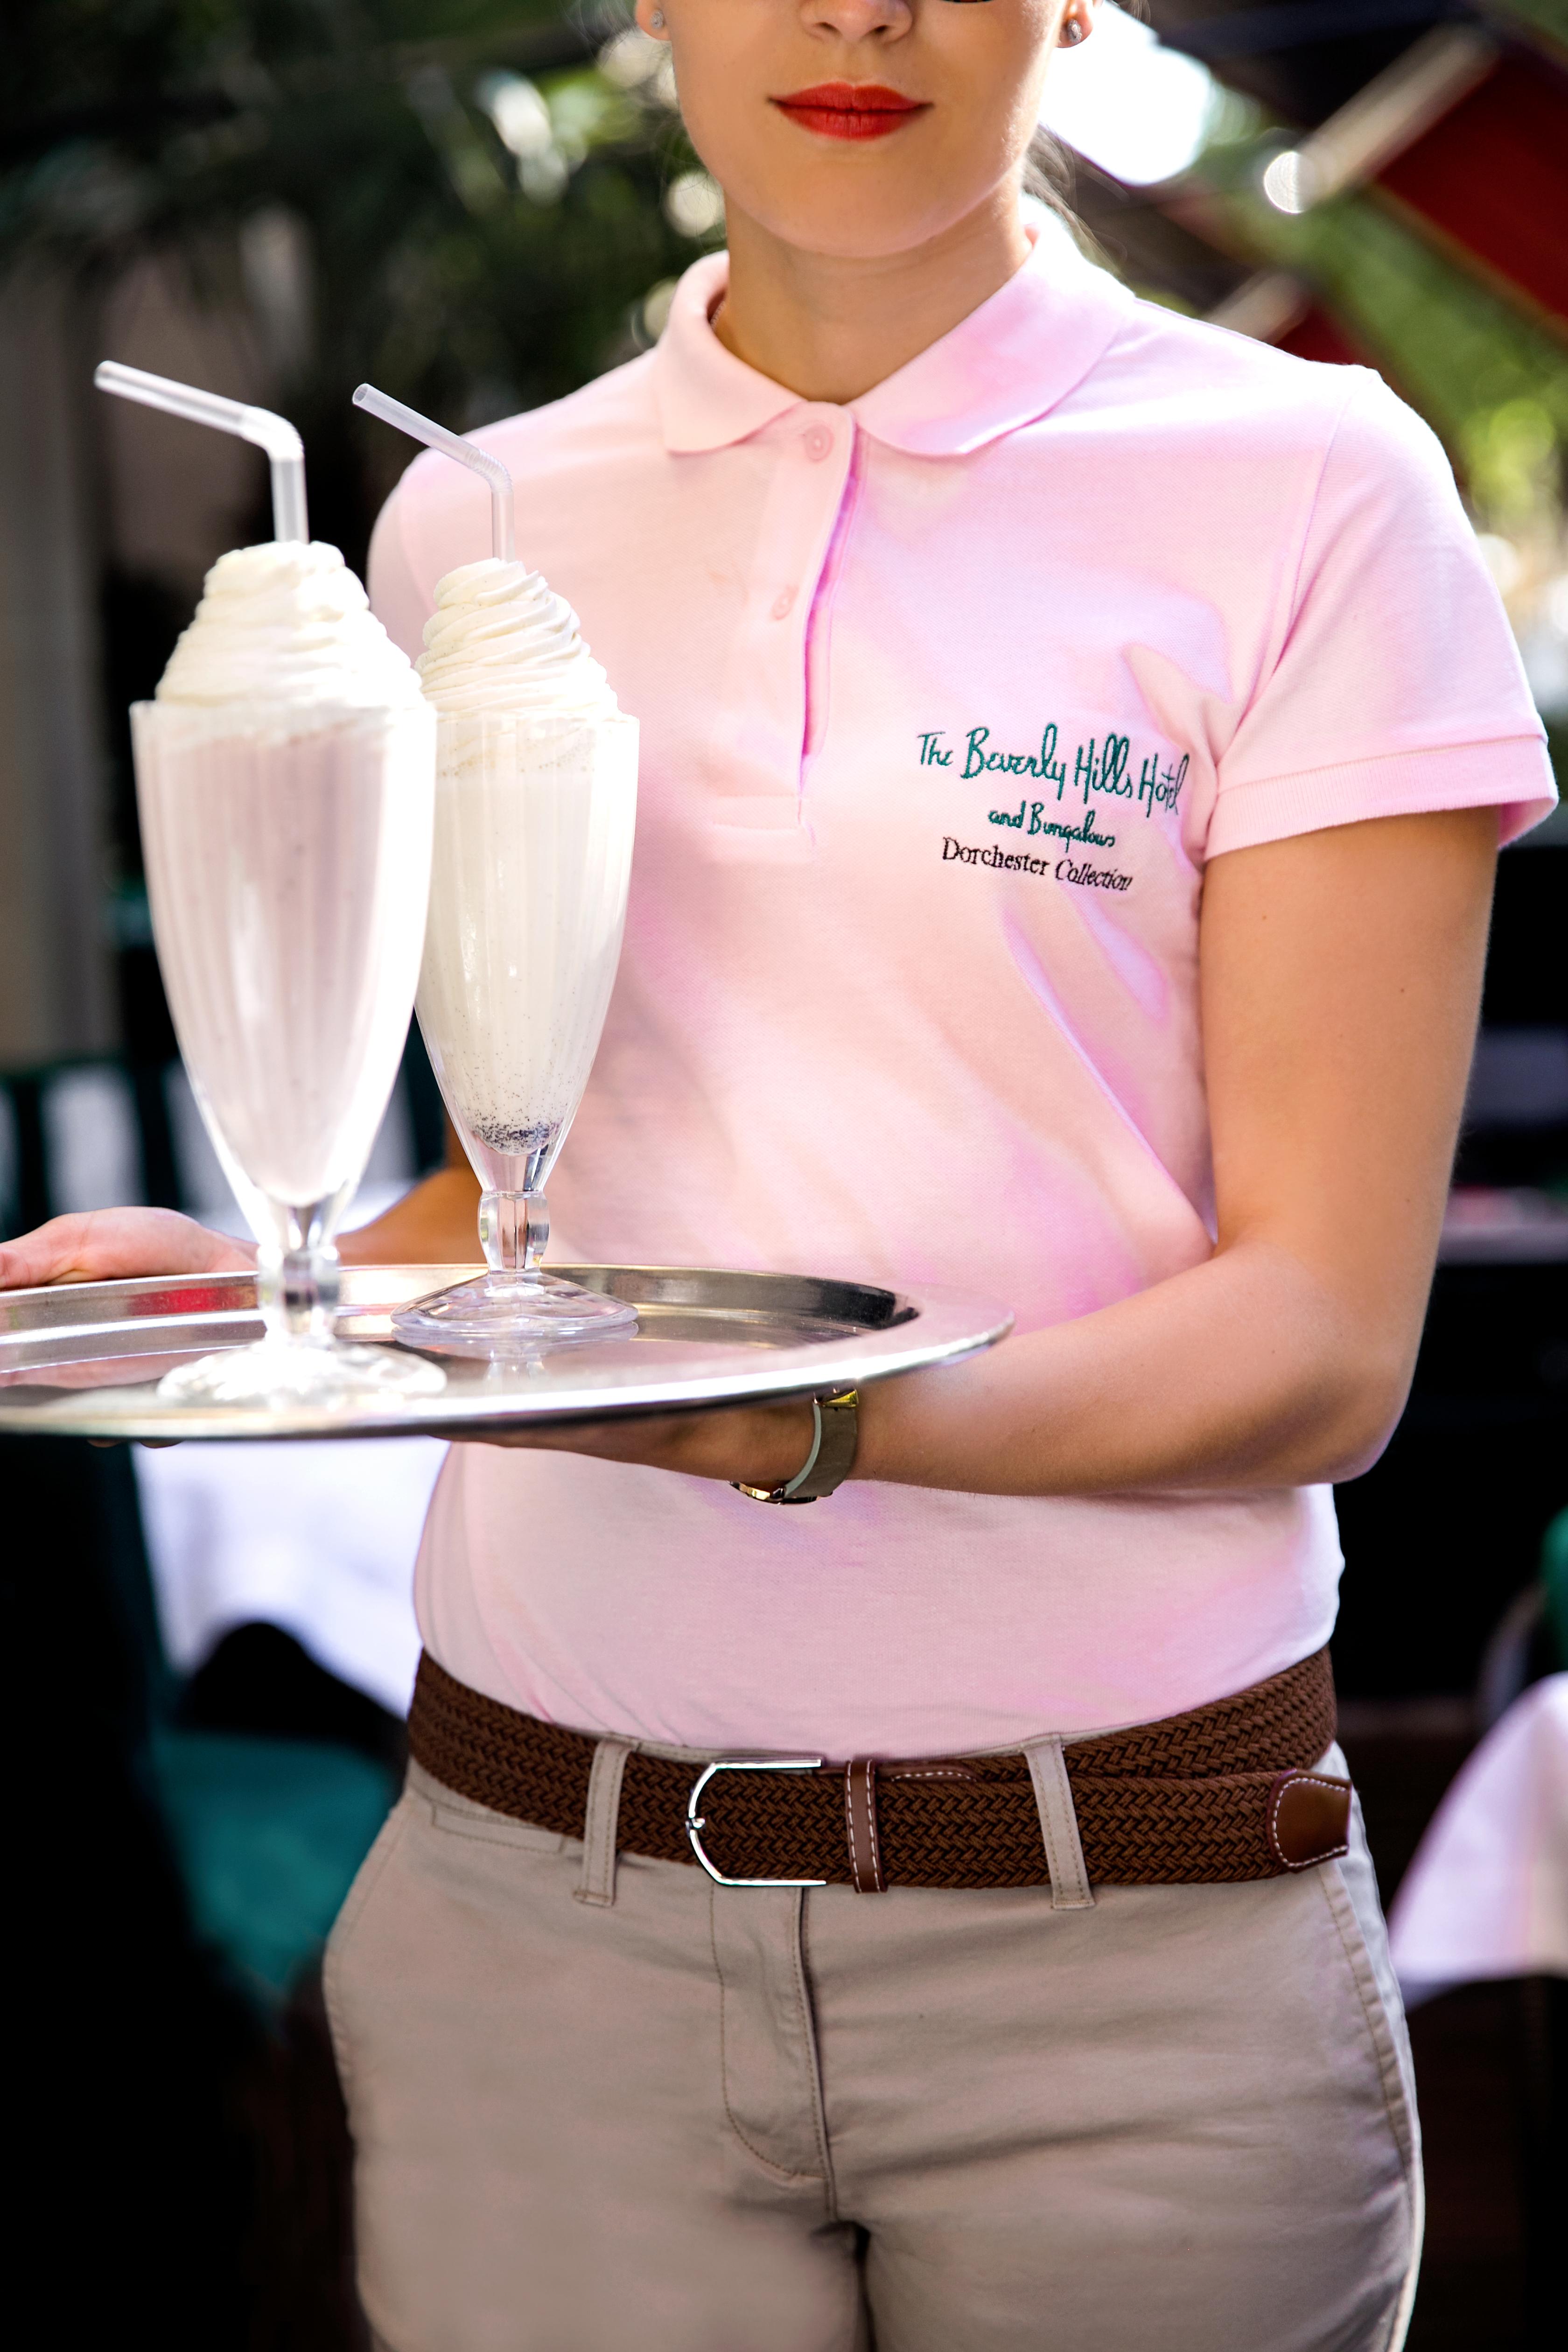 HPA-Cabana-Cafe-Strawberry-Milkshake-2-HR-by-Hana-Le-Van